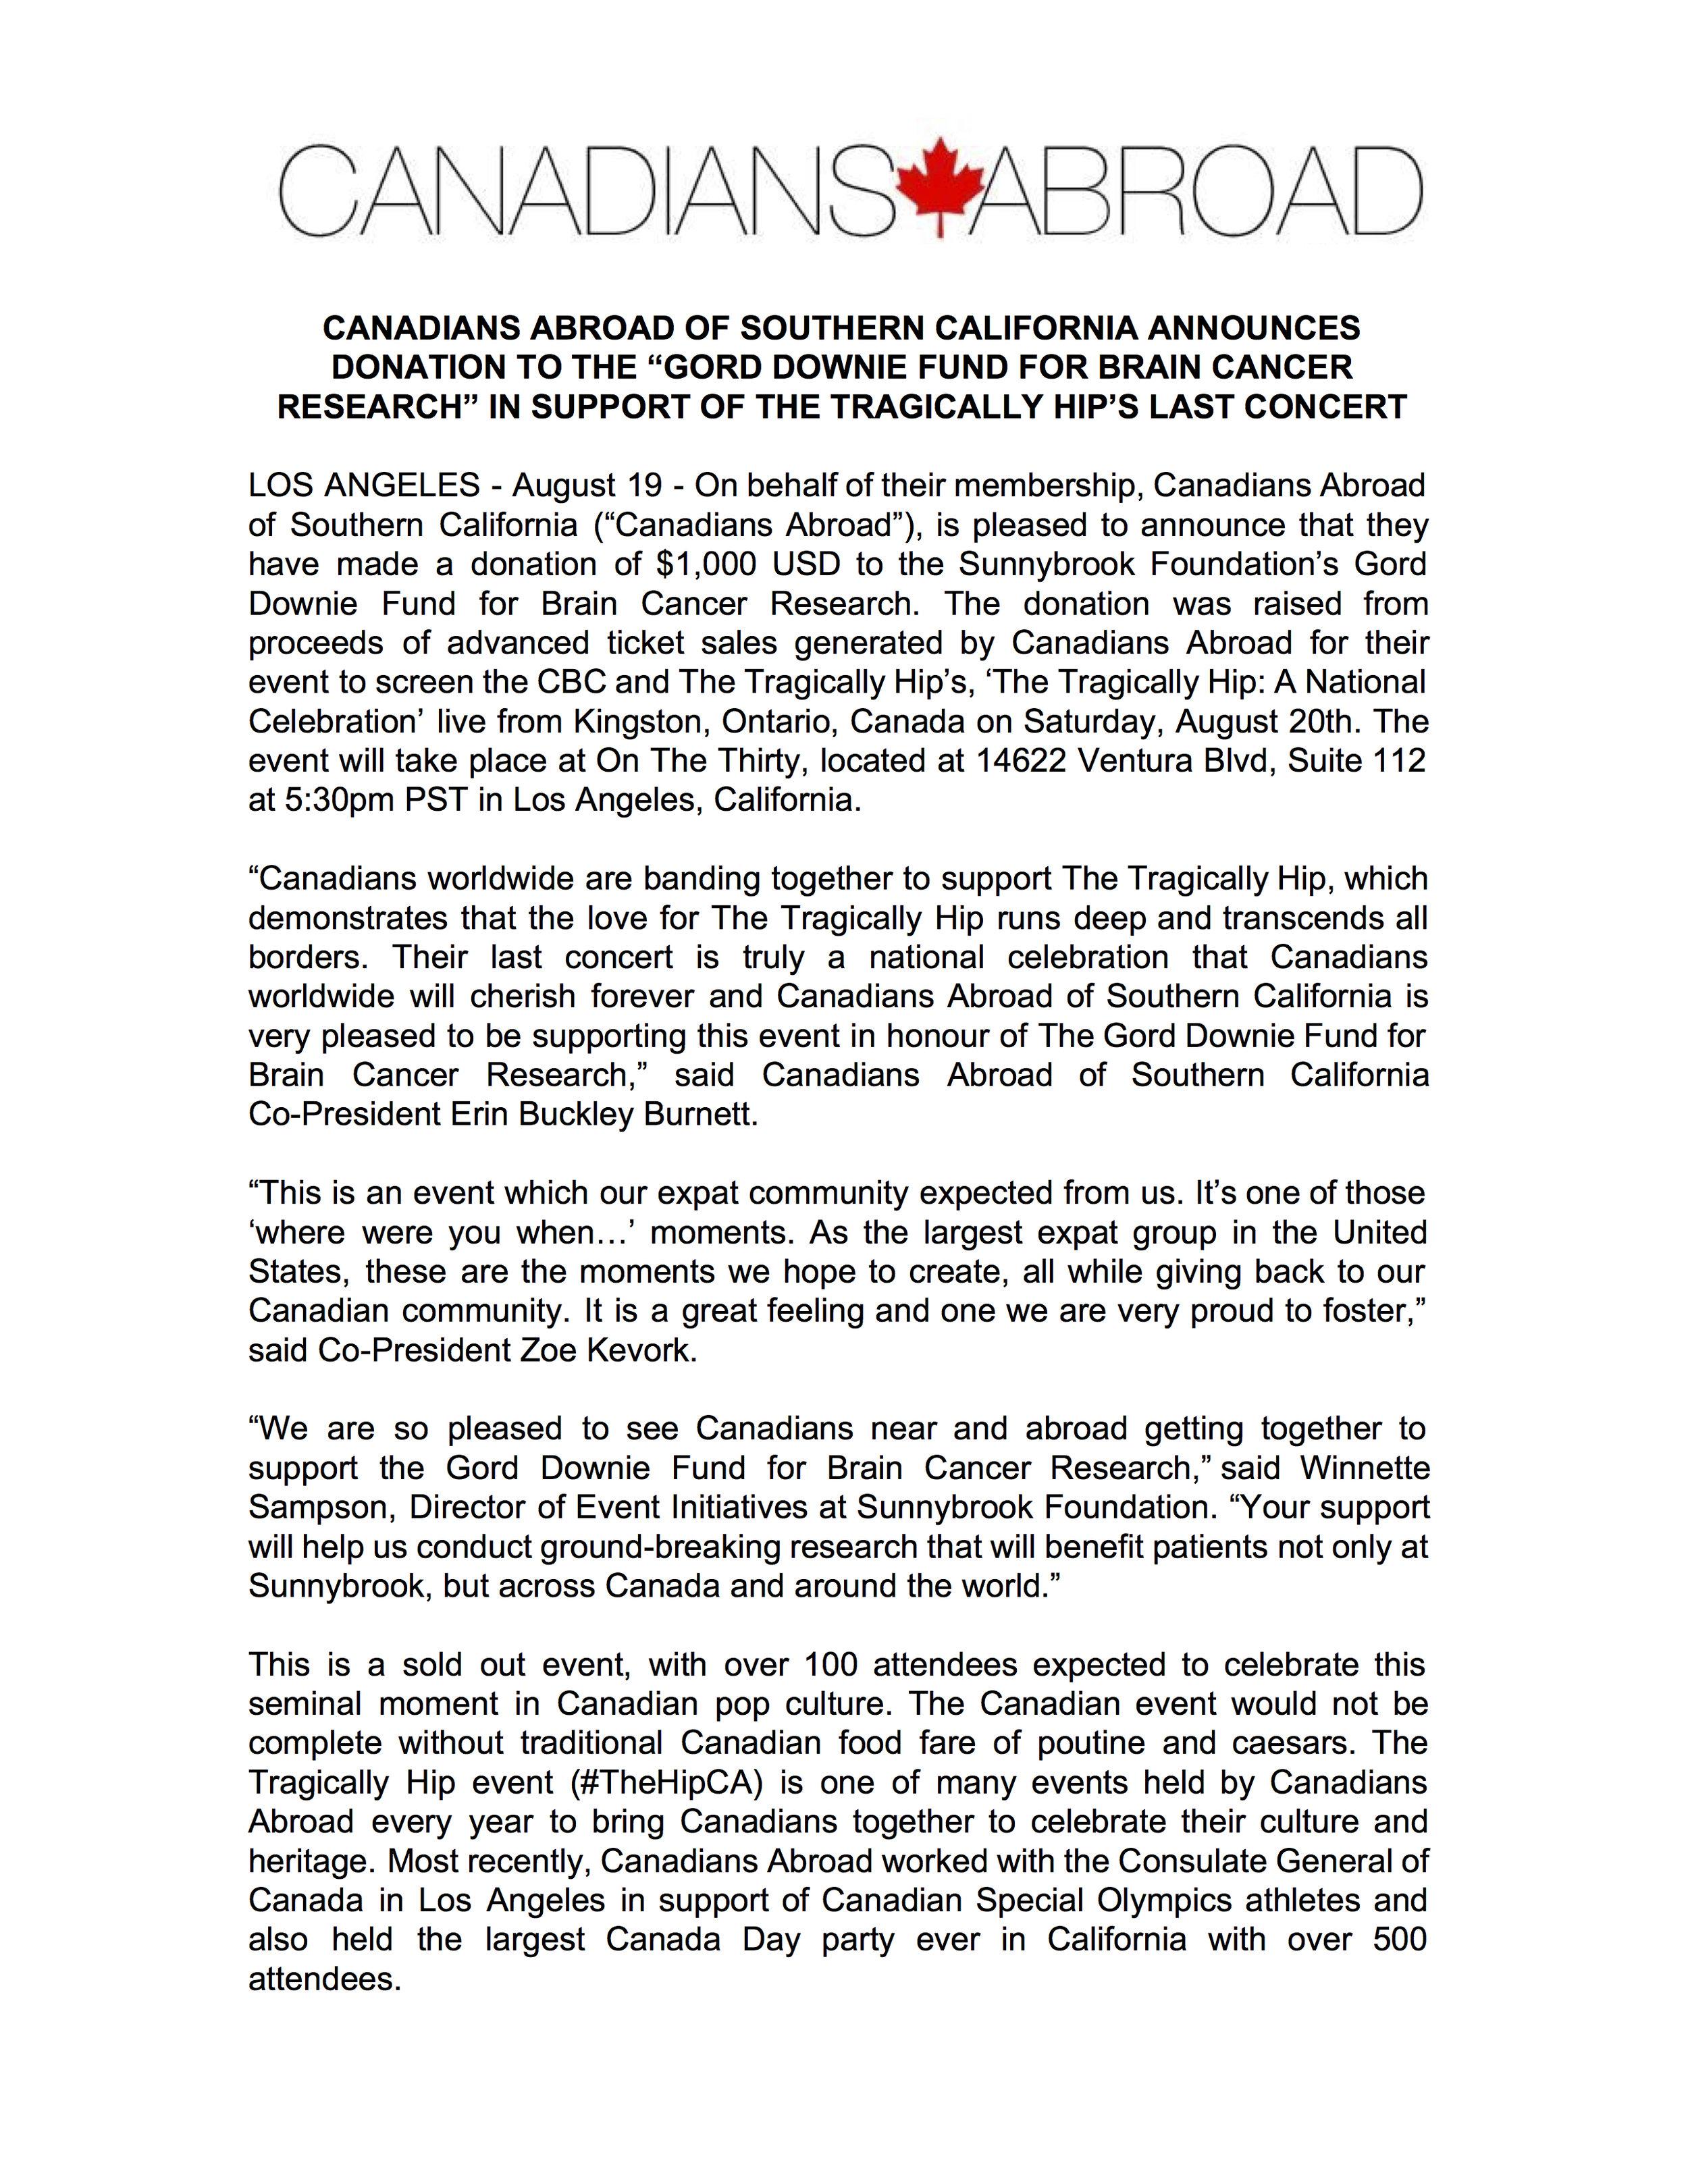 Gord Downie Fund Donation Press Release